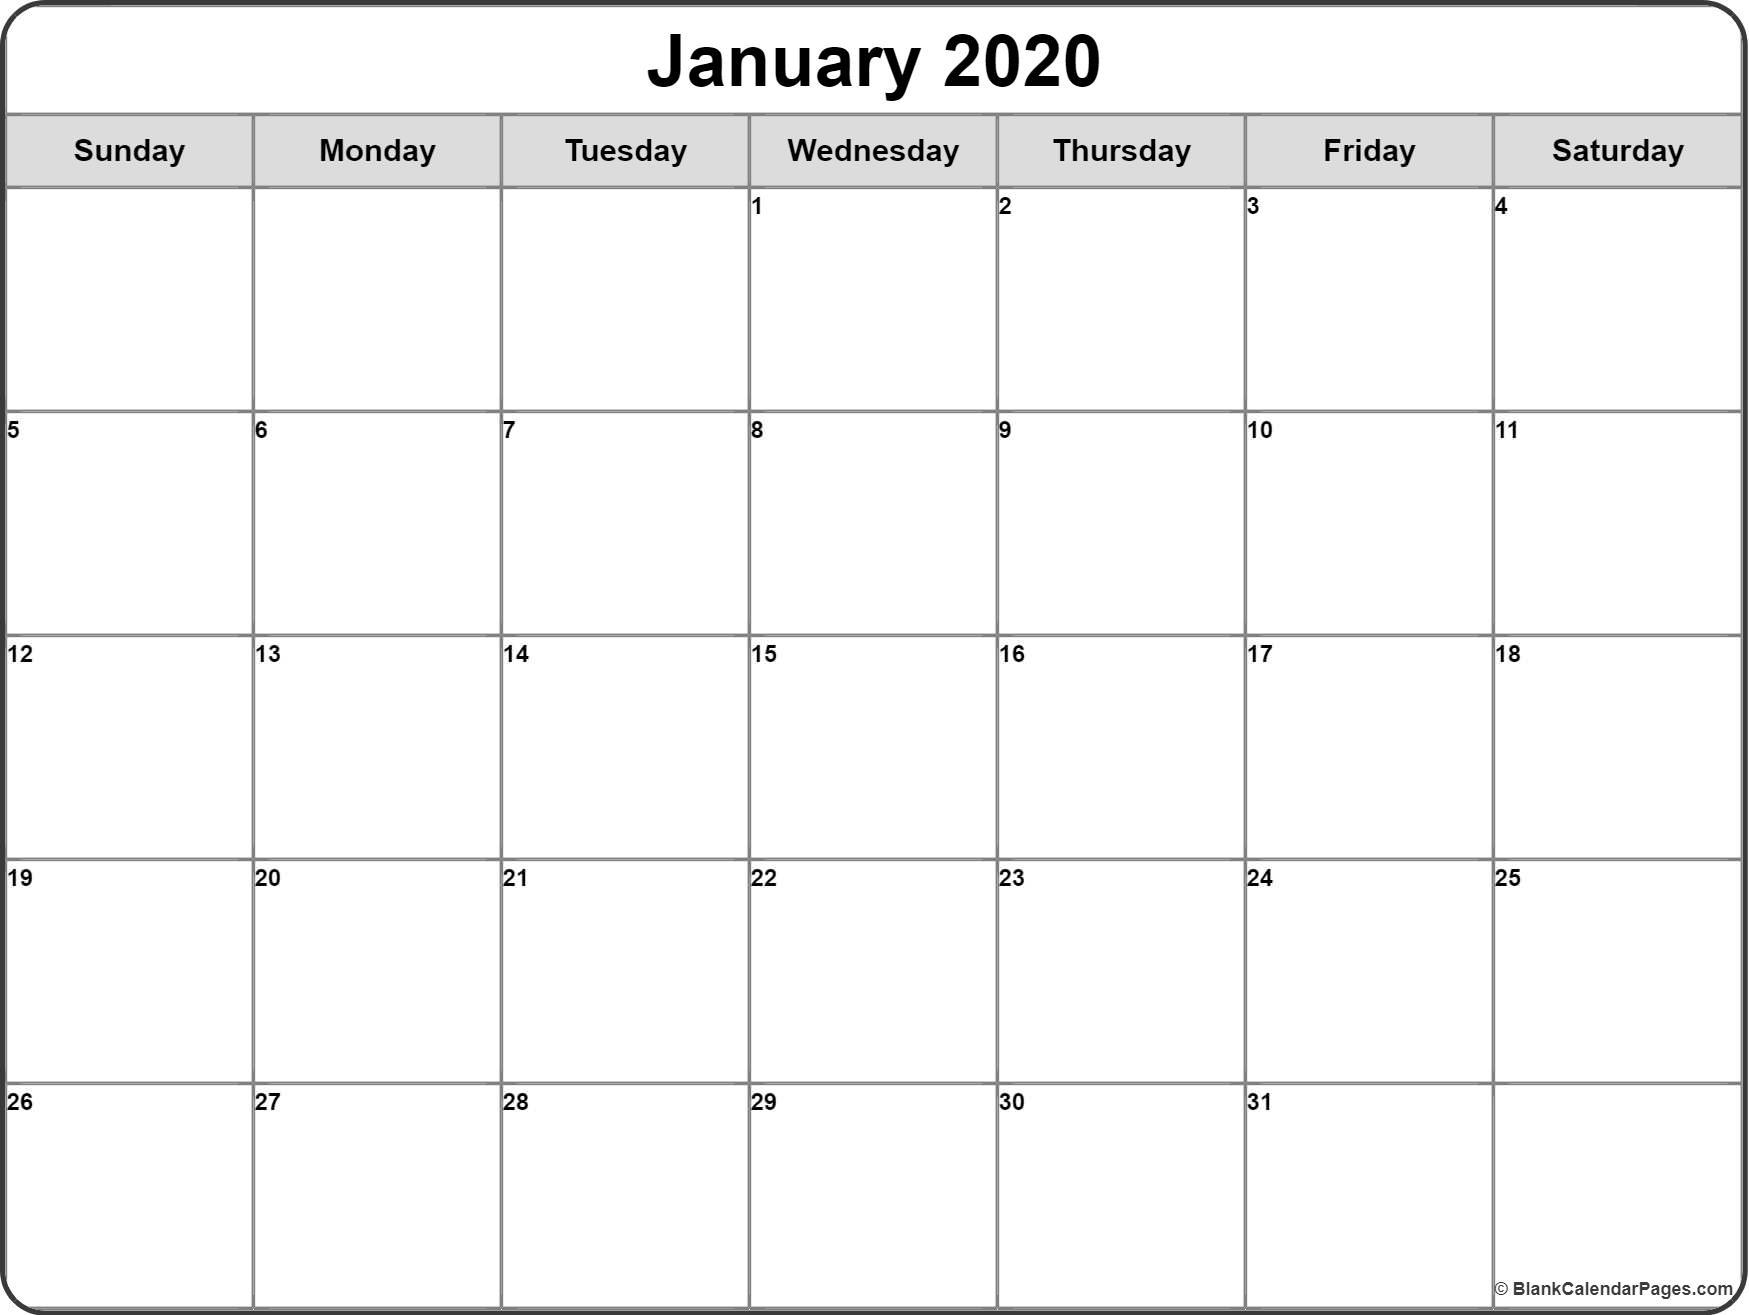 January 2020 Calendar | Free Printable Monthly Calendars pertaining to 2020 Printable Calendar By Month